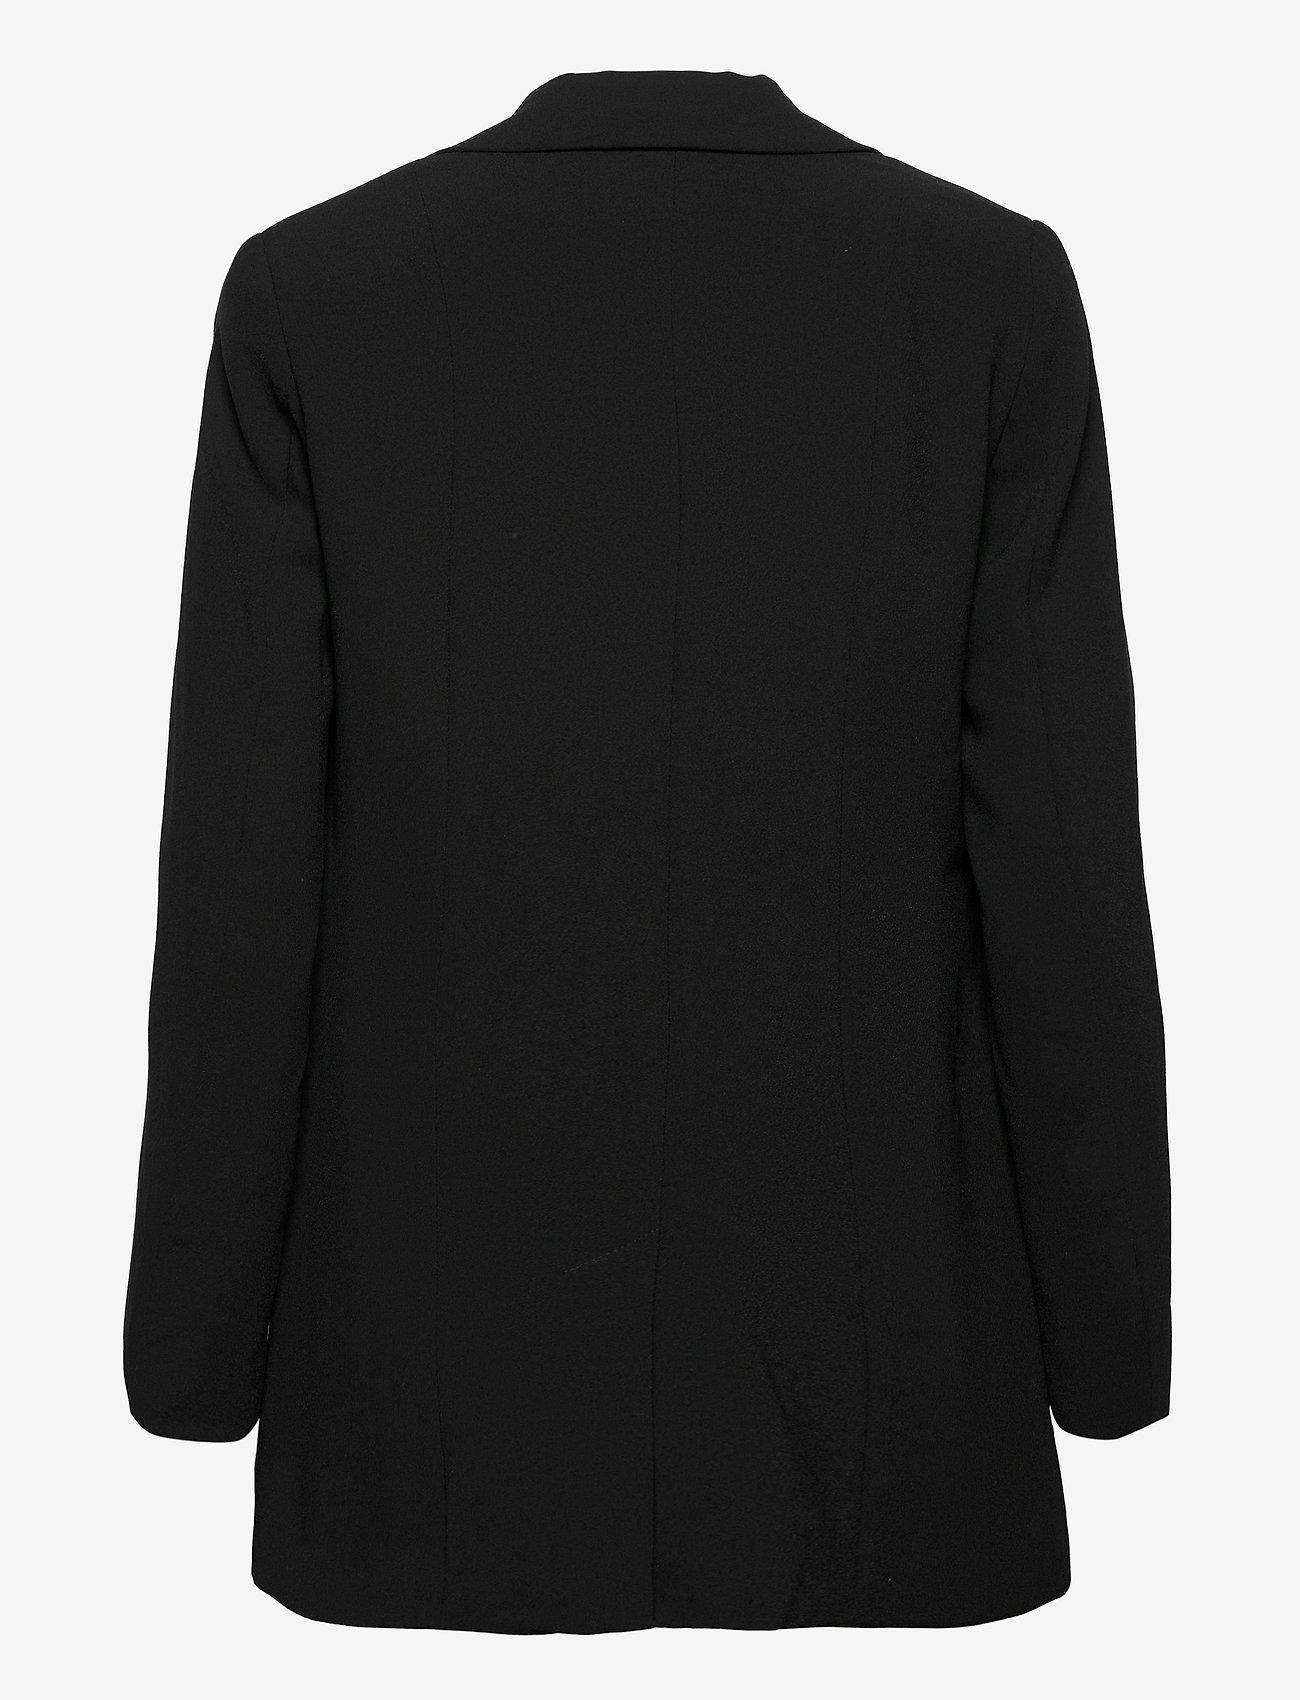 Stylein - BENITO JACKET - oversized blazers - black - 1